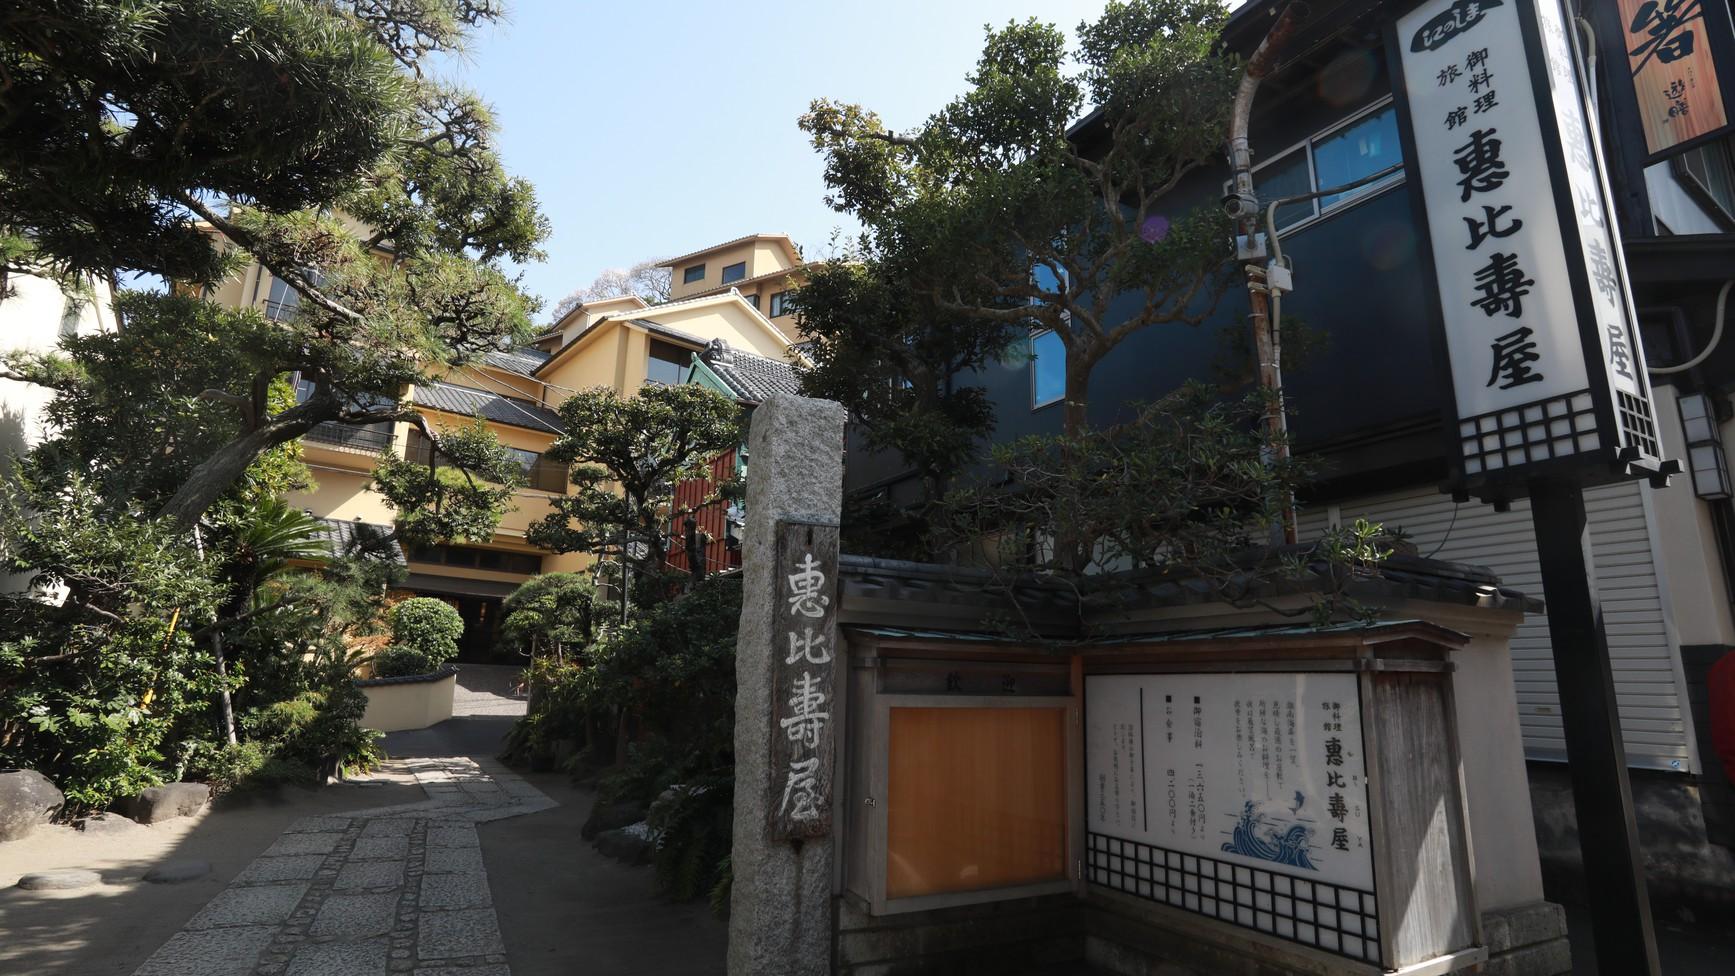 湘南江の島 御料理旅館 恵比寿屋の施設画像